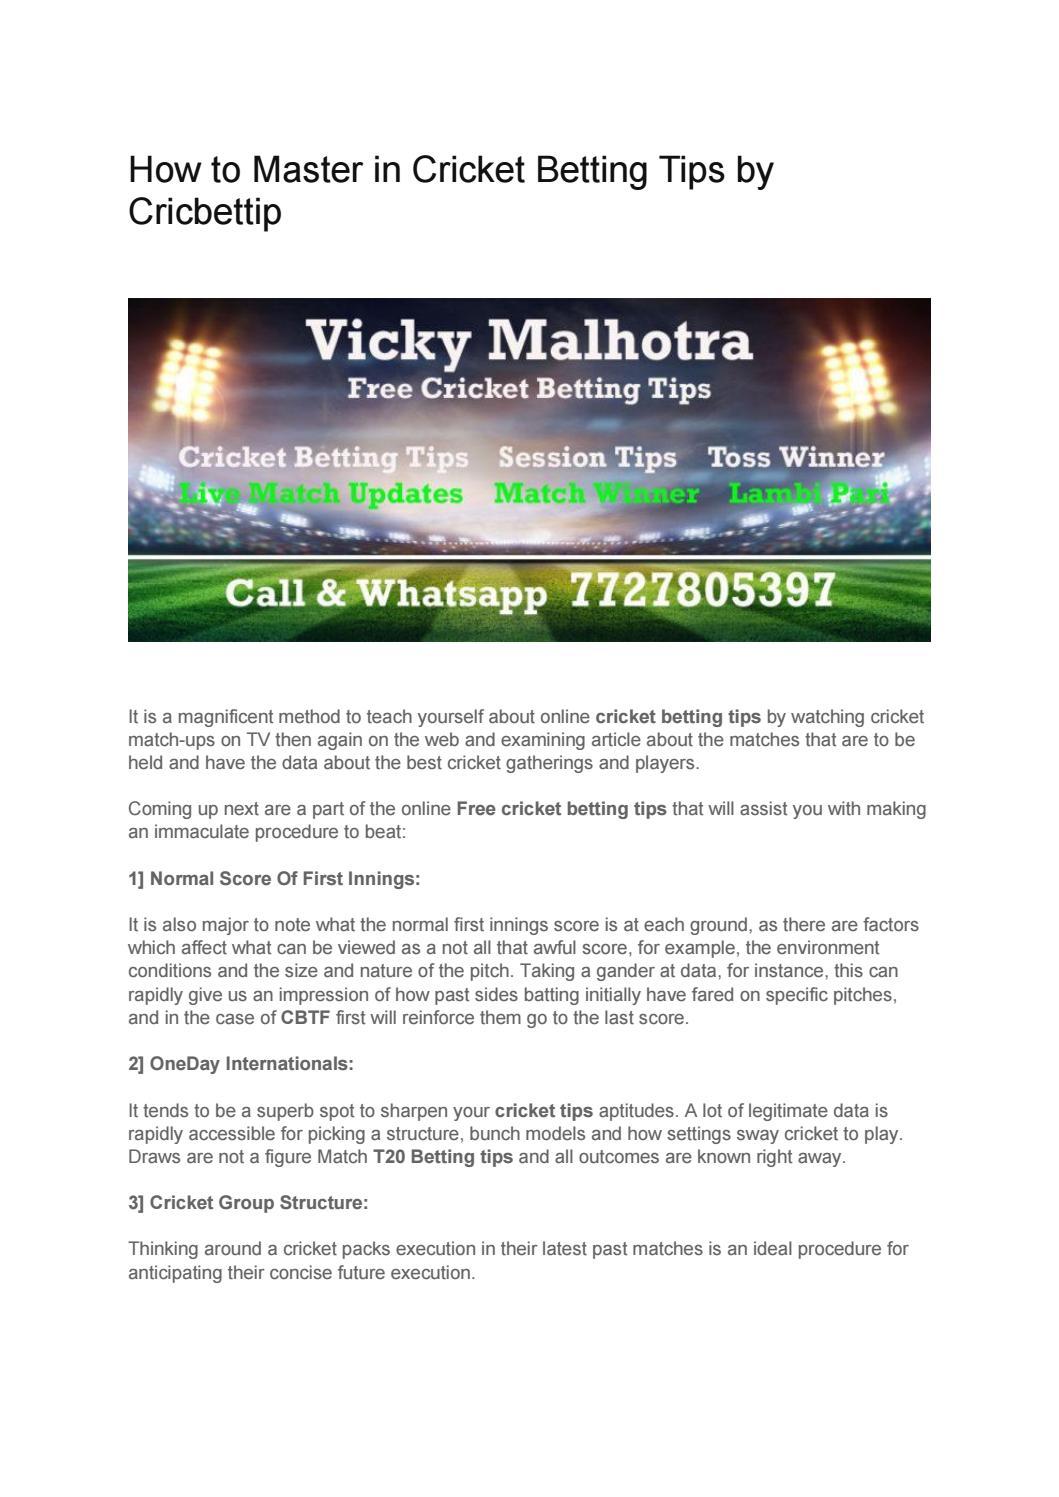 Online cricket betting session exchange betting sites ukraine